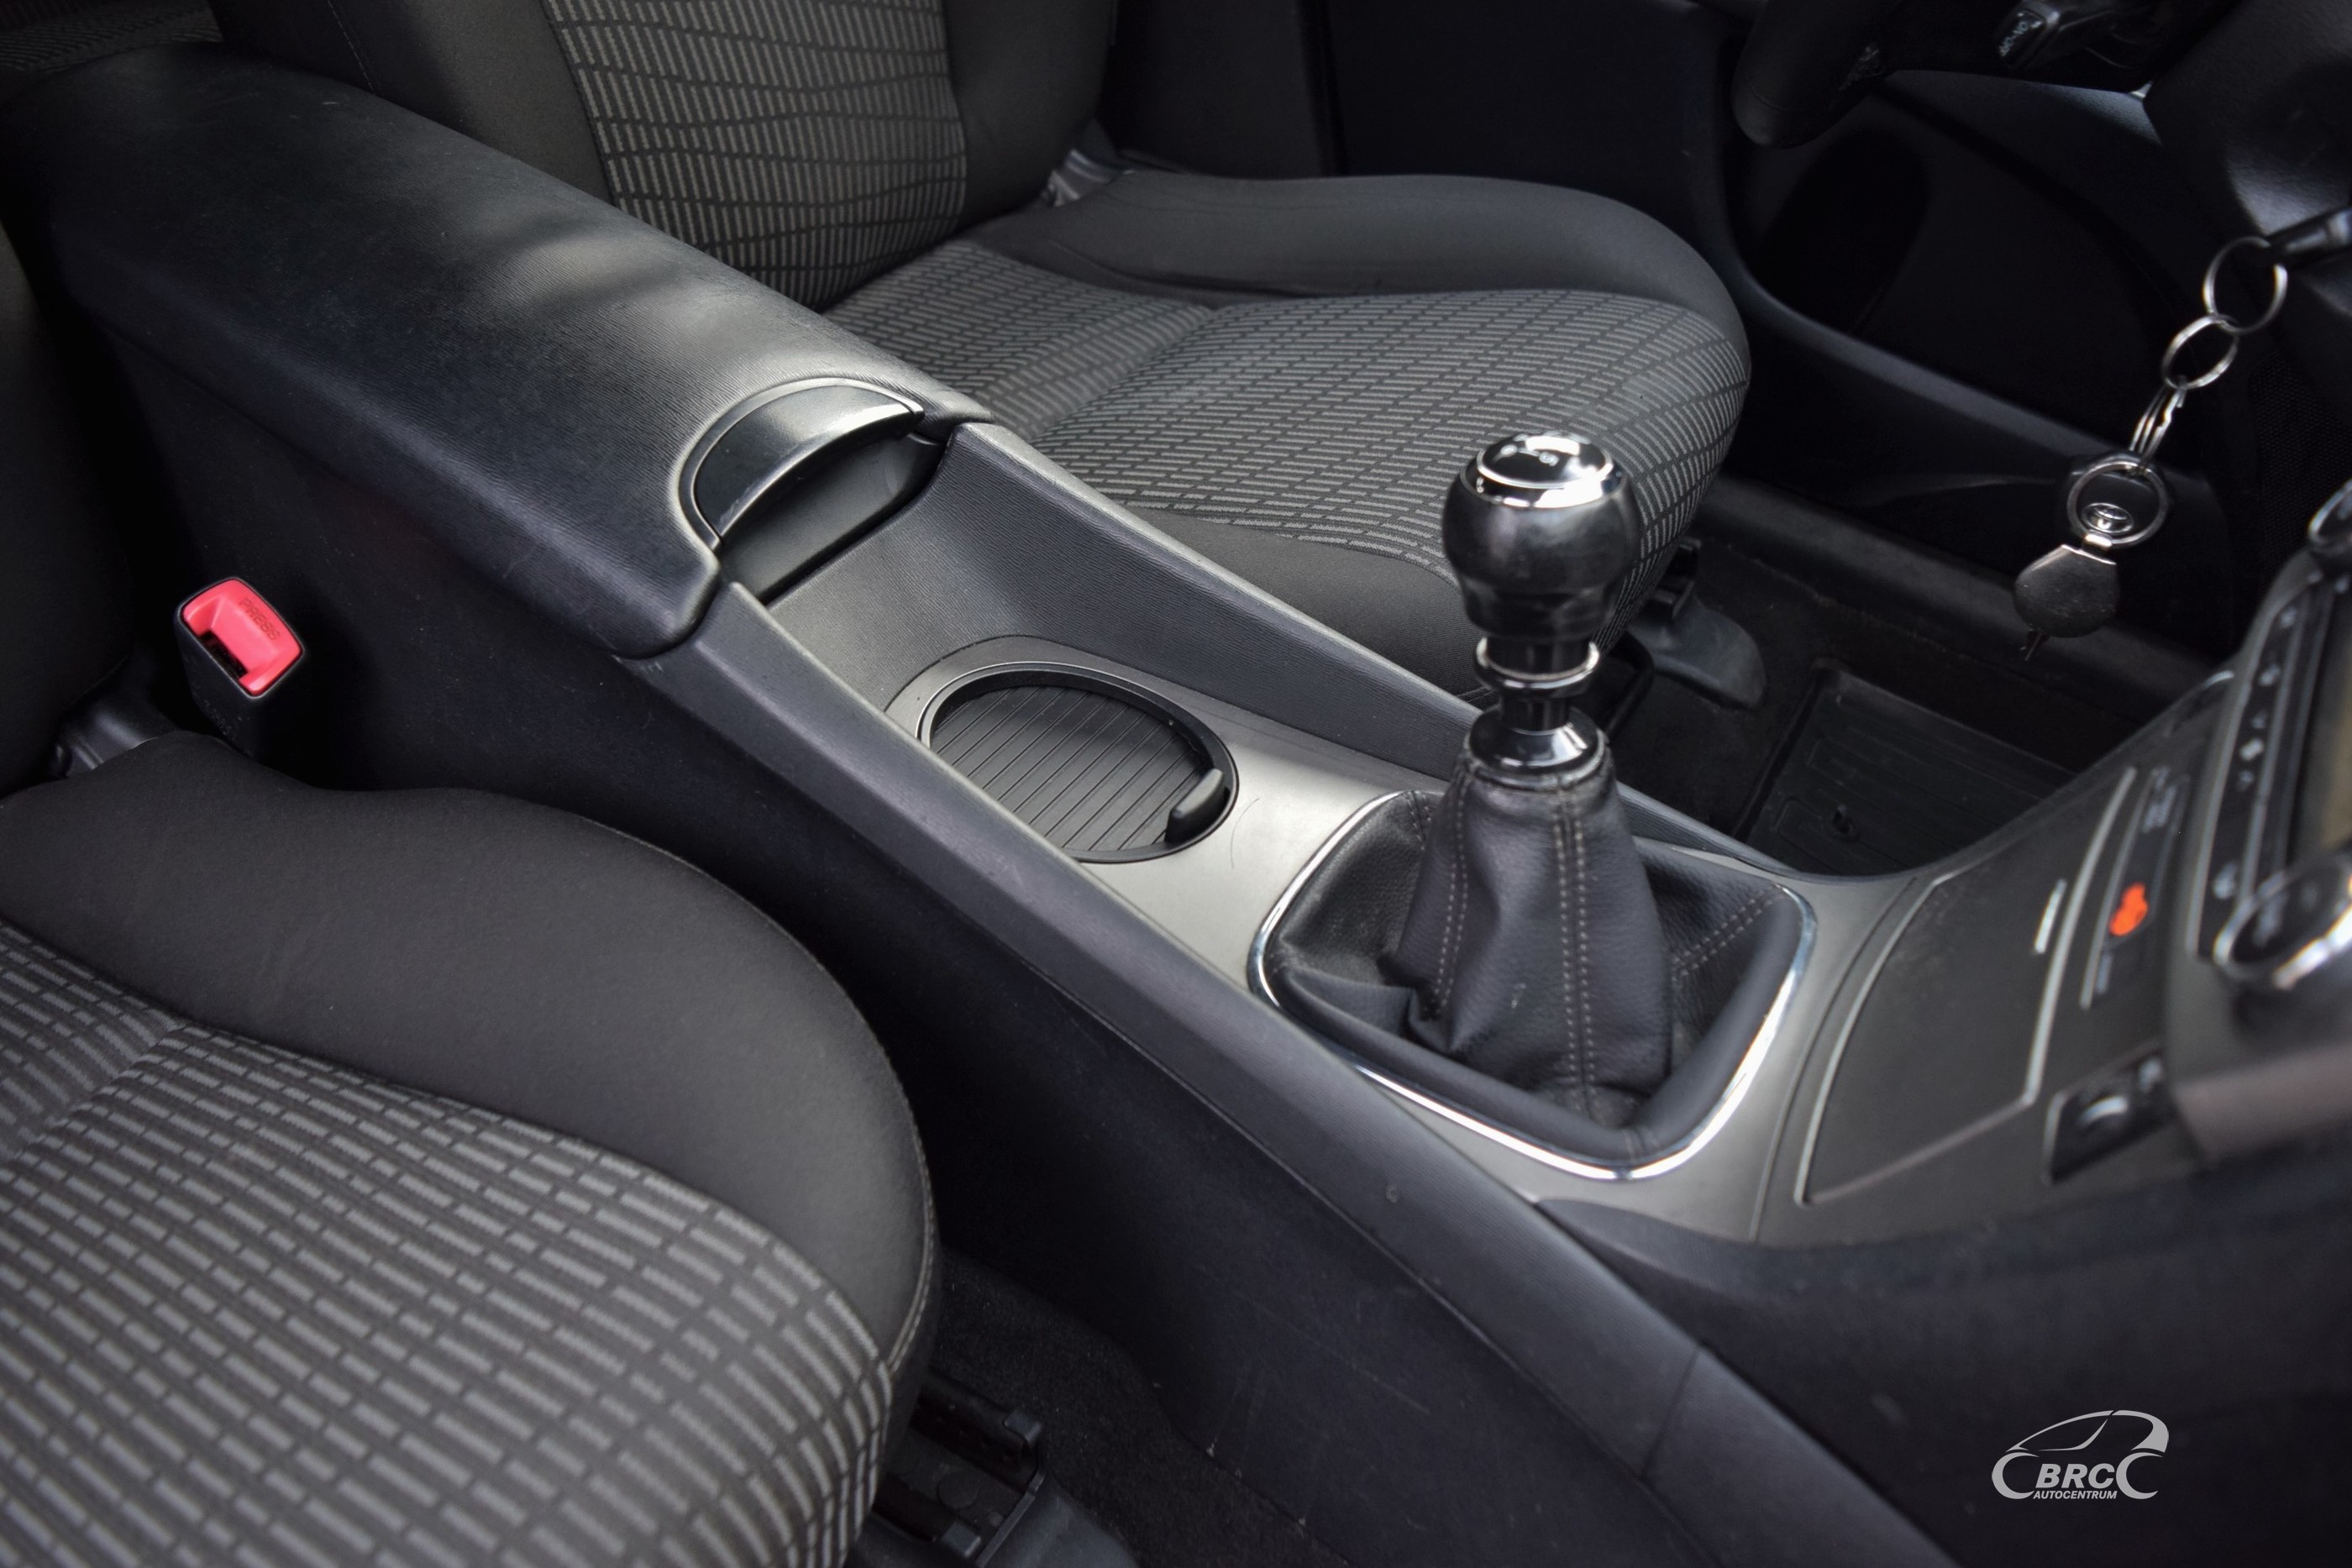 Toyota Avensis M/T